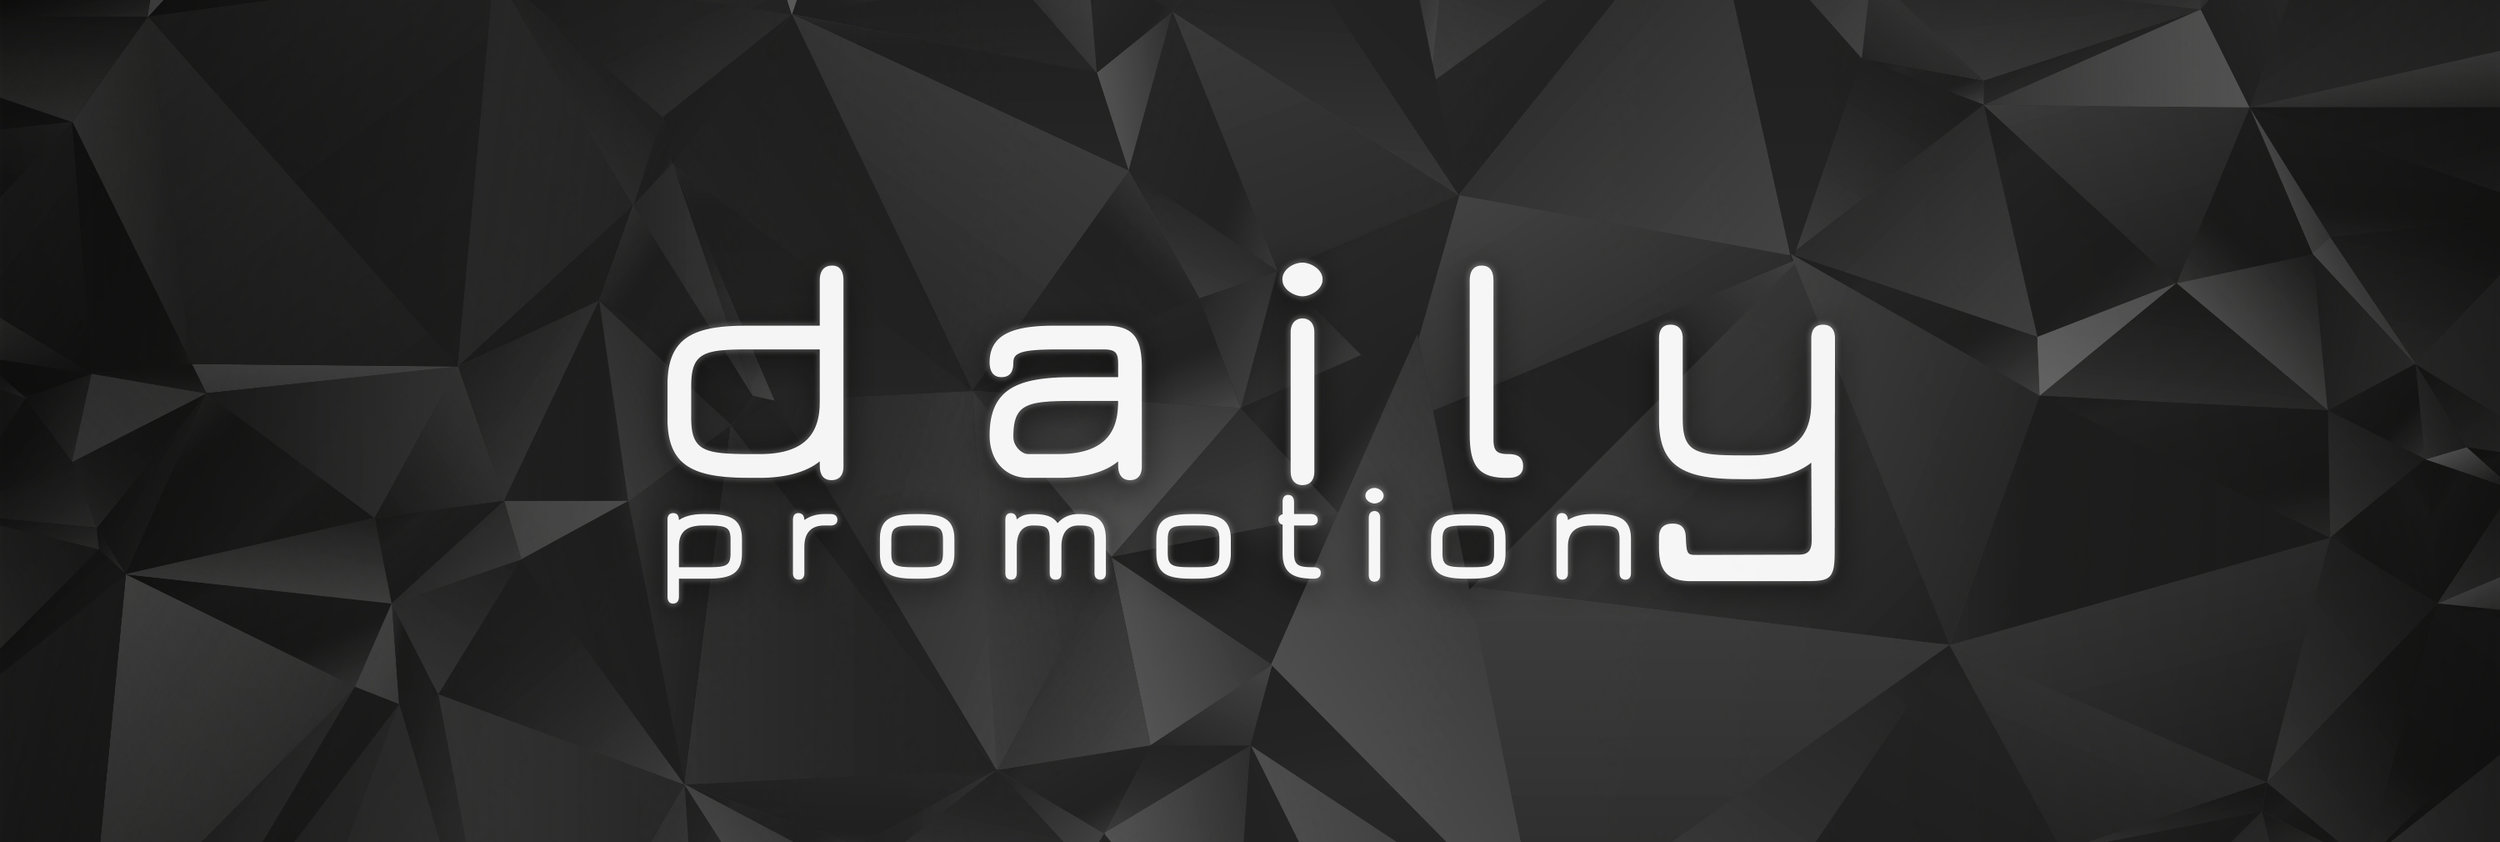 bild sida daily promotion  2  3000pix 3.jpg